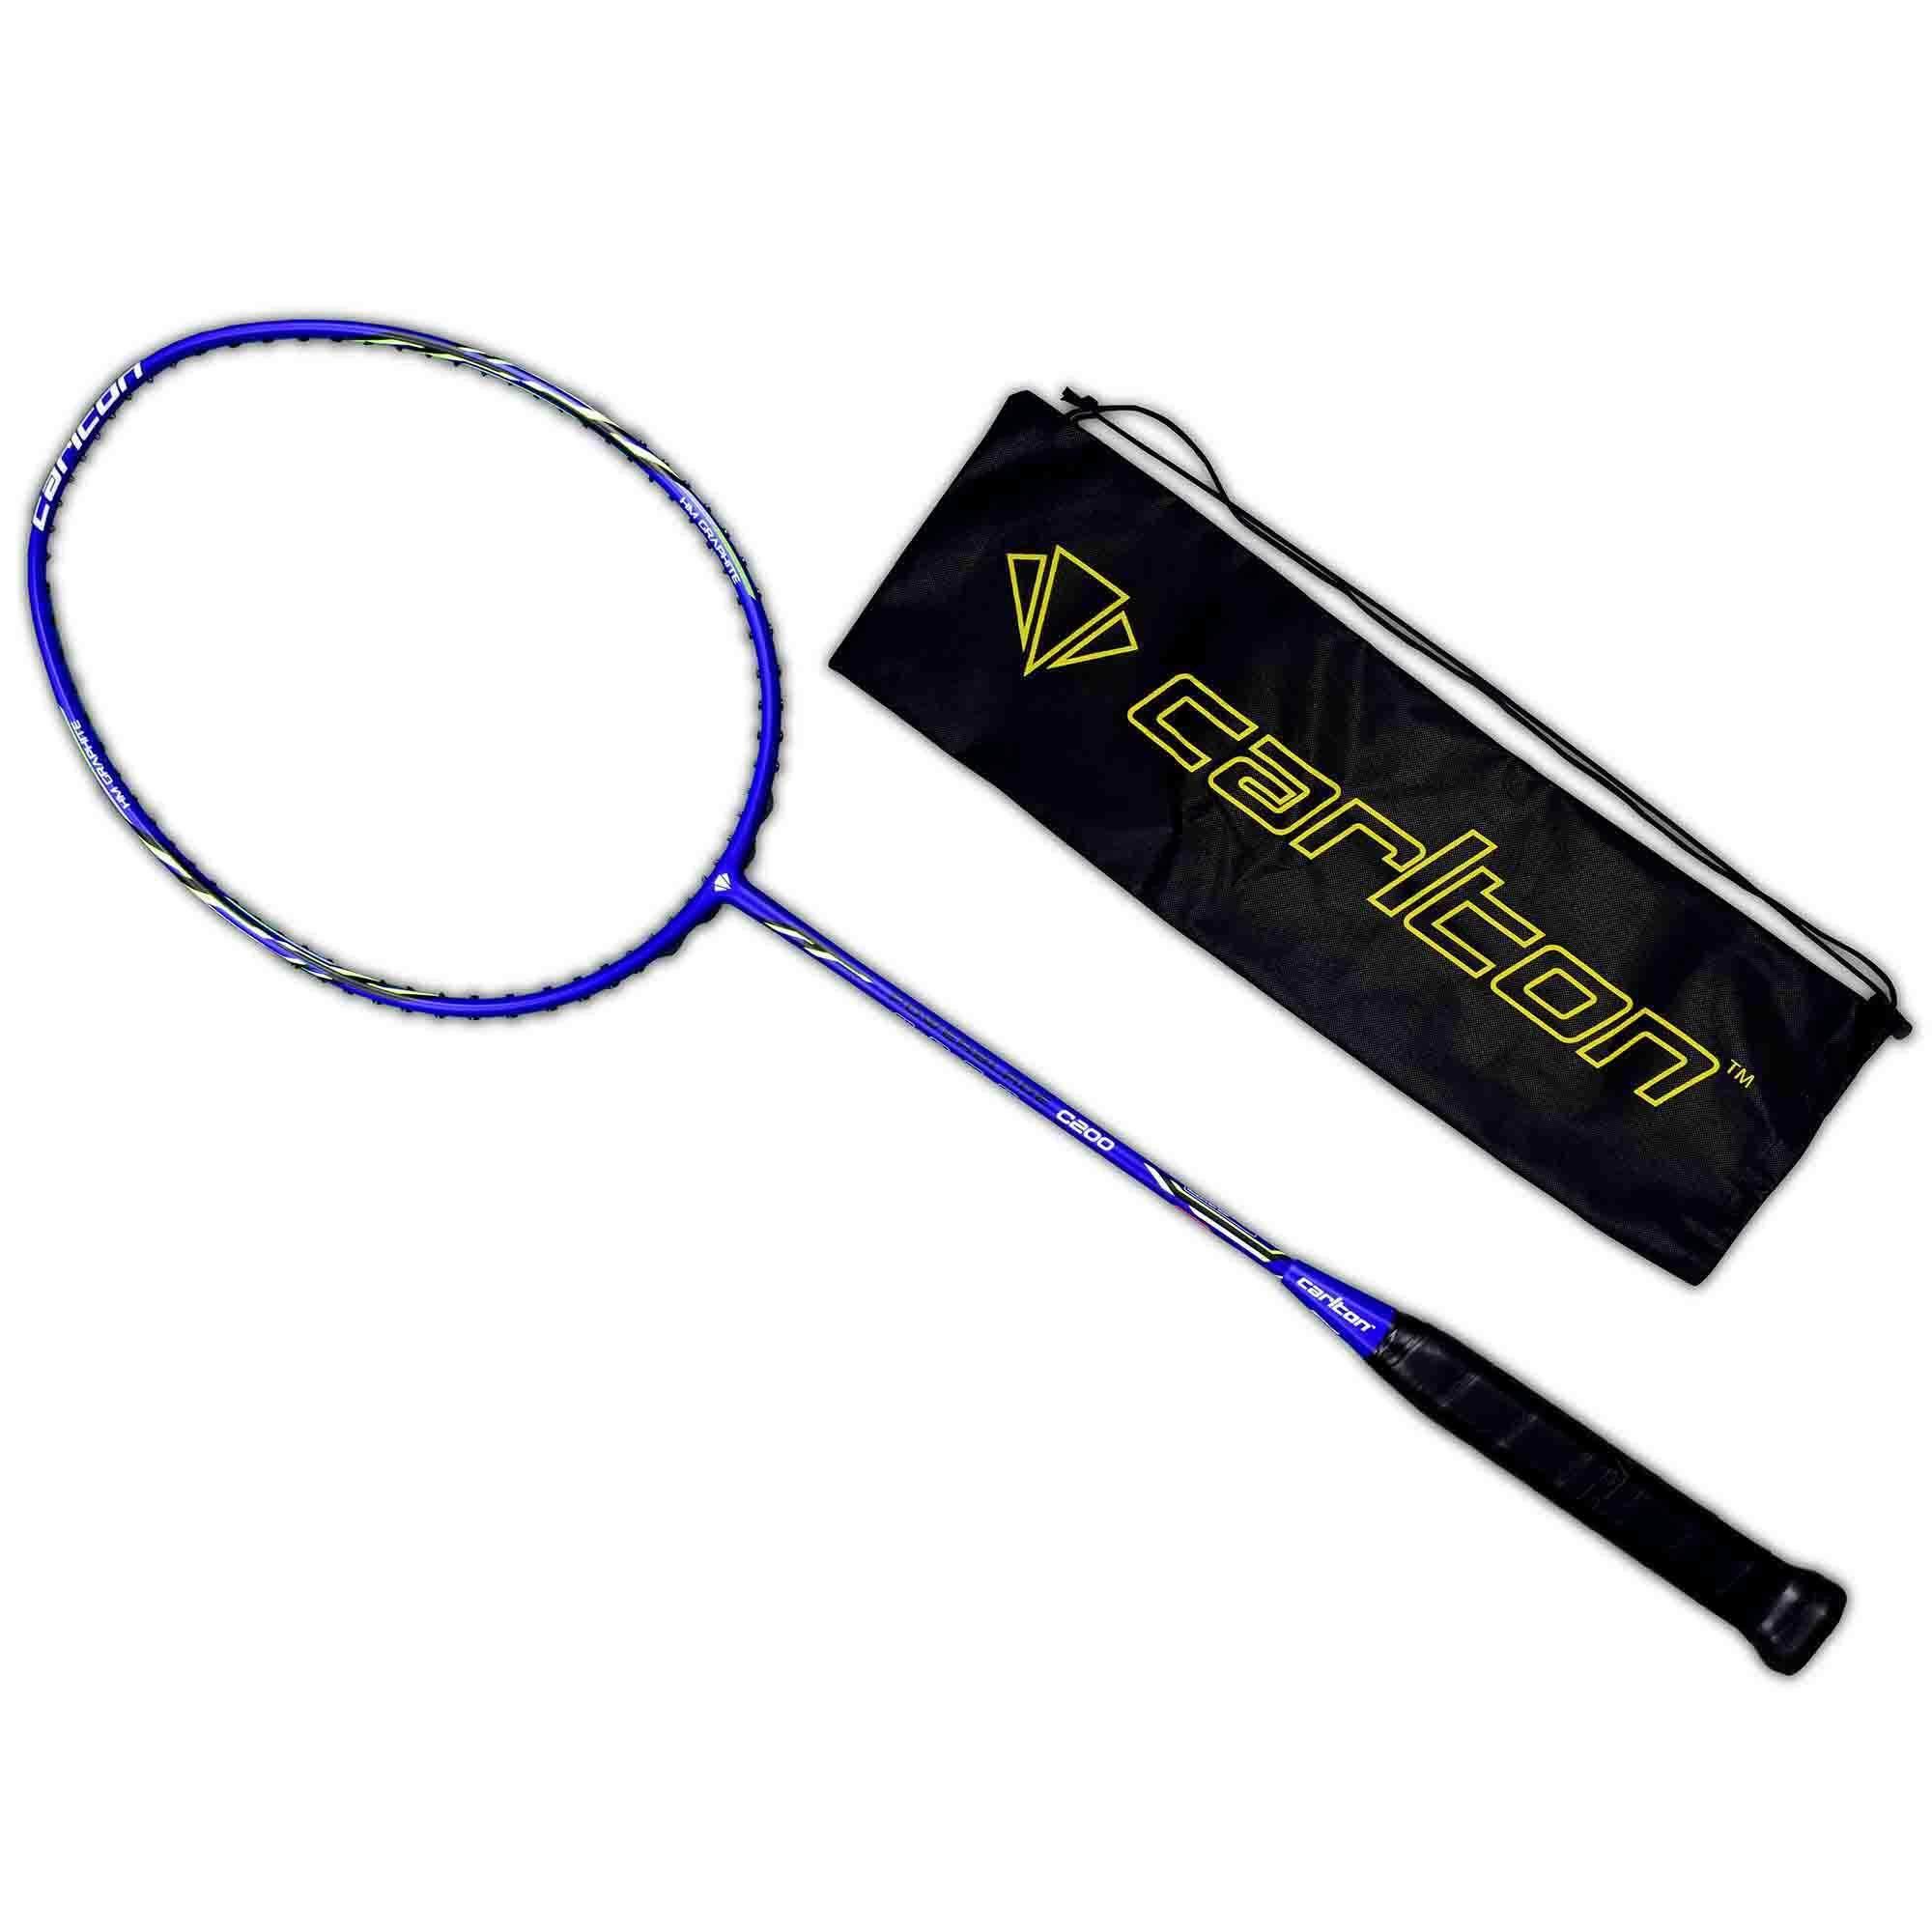 Carlton Badminton Racket Powerblade C 200